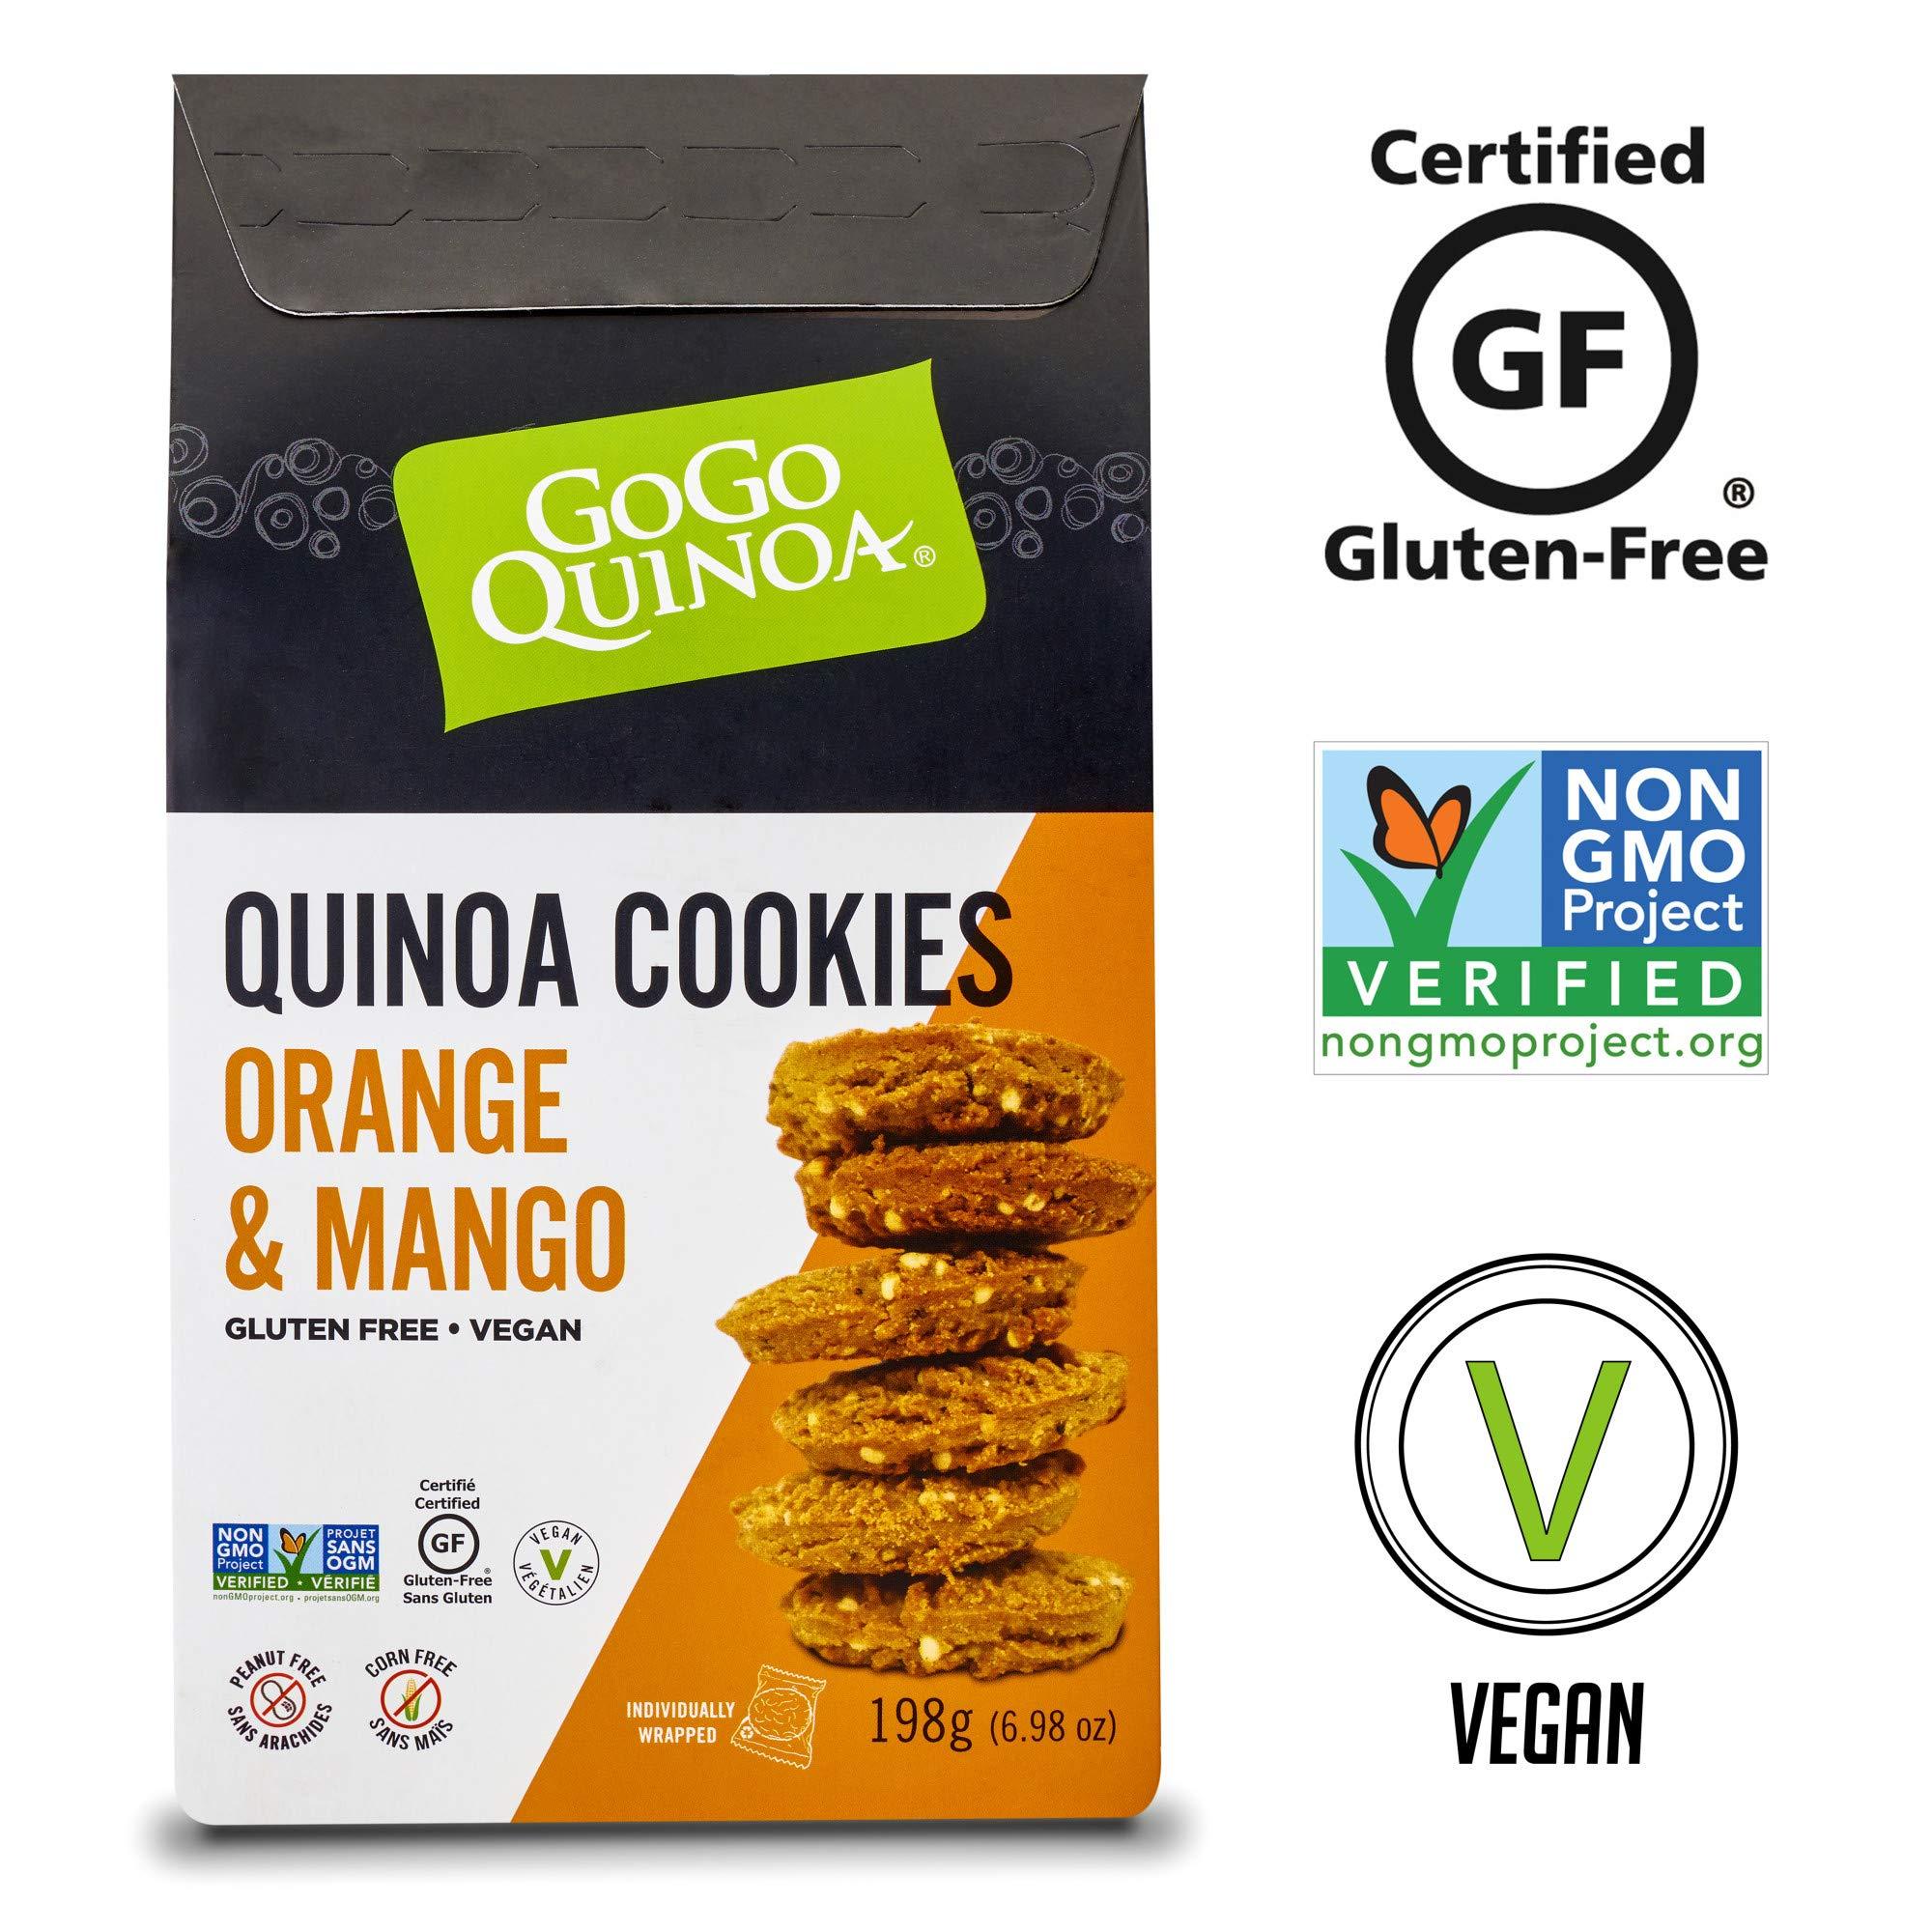 GoGo Quinoa Wheat, Corn and Egg Free Orange & Mango Essence Cookies, With Exotic Aroma and Fruity Taste Notes 13.96 oz